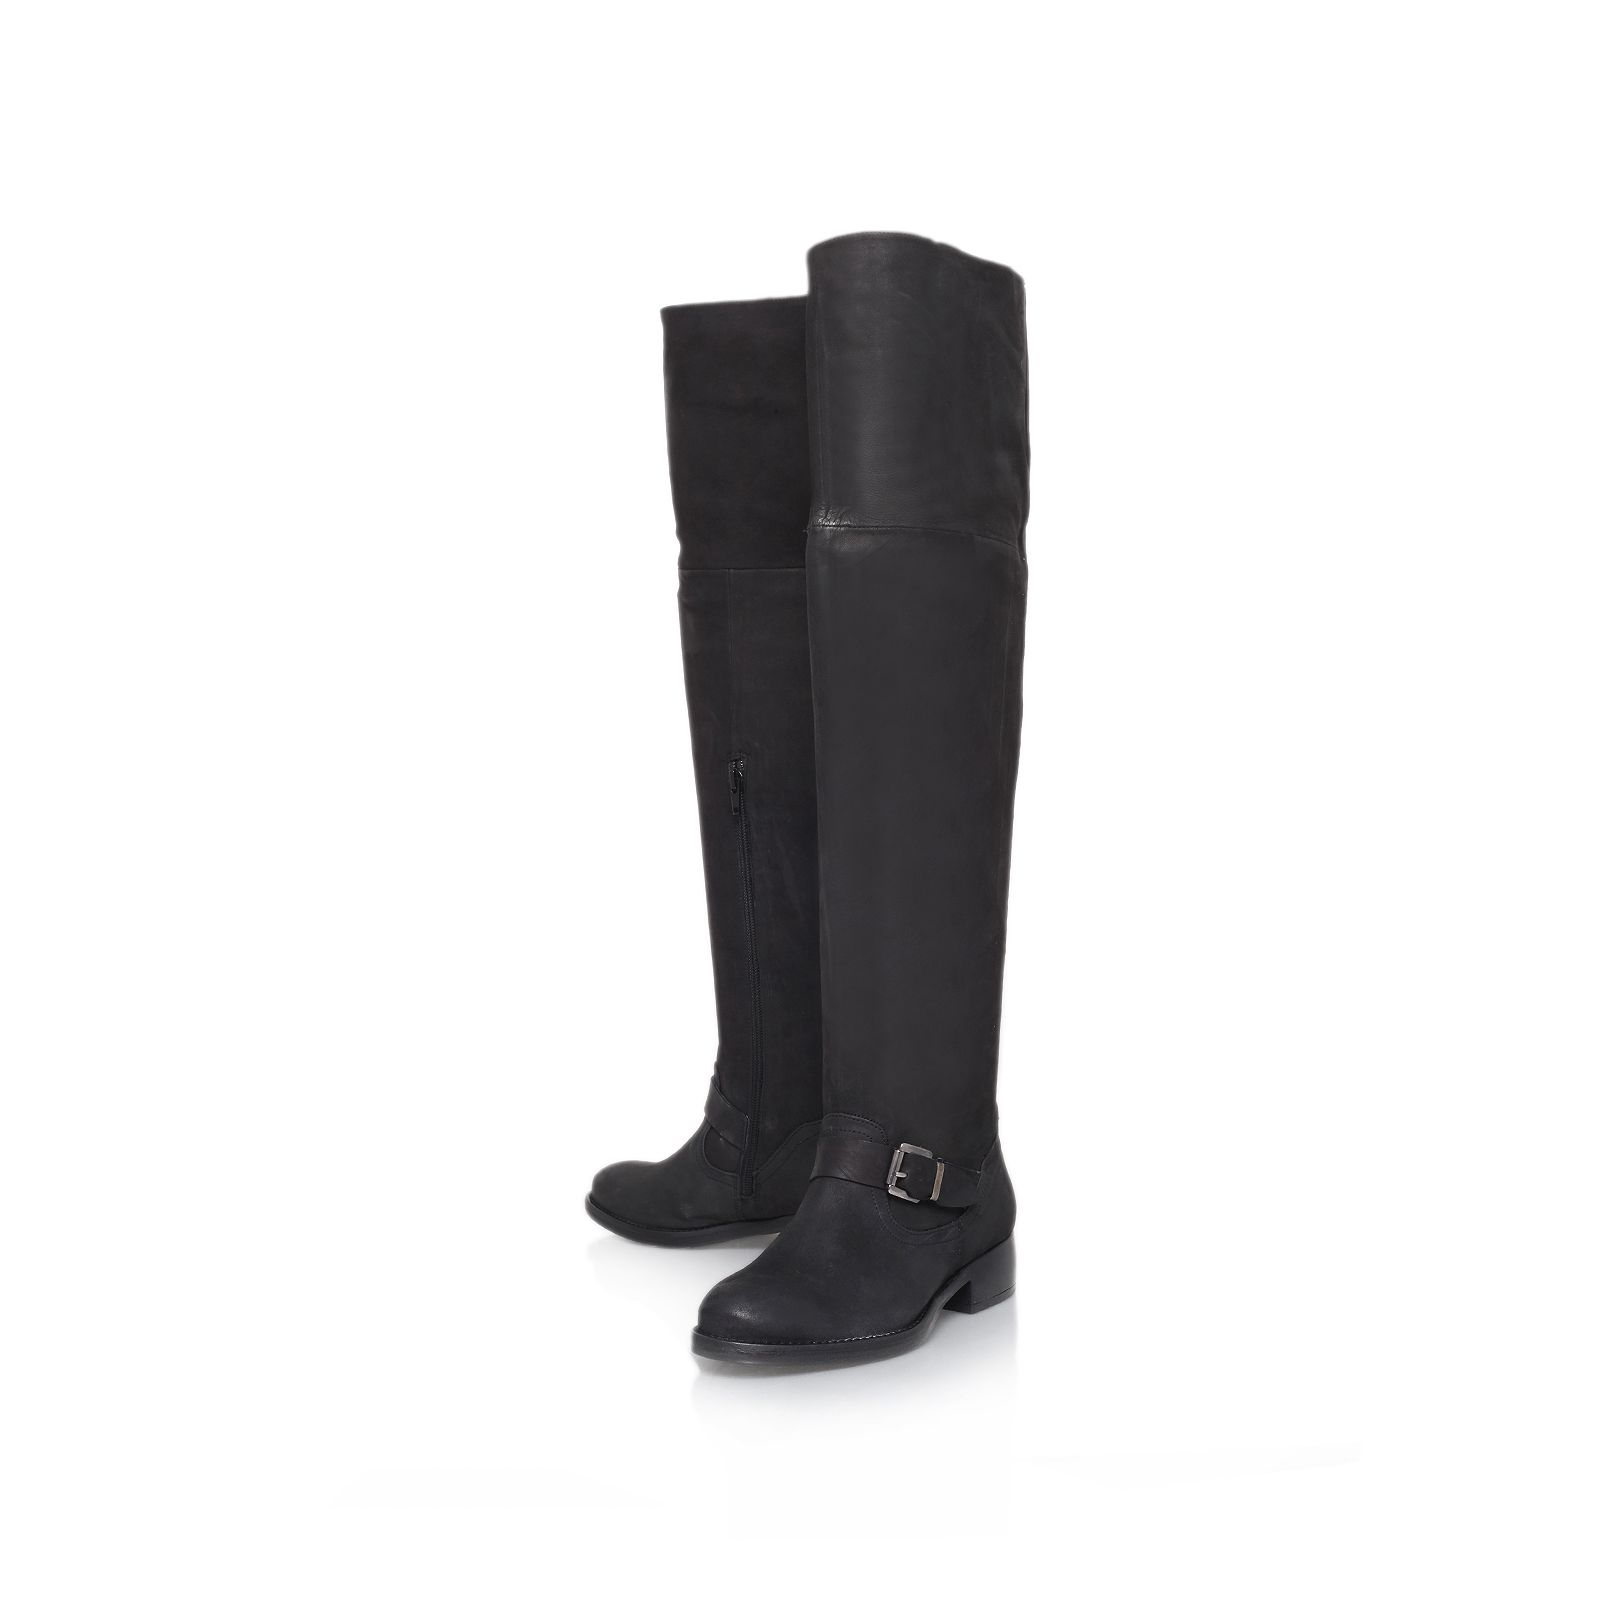 kurt geiger knee high boots in black lyst